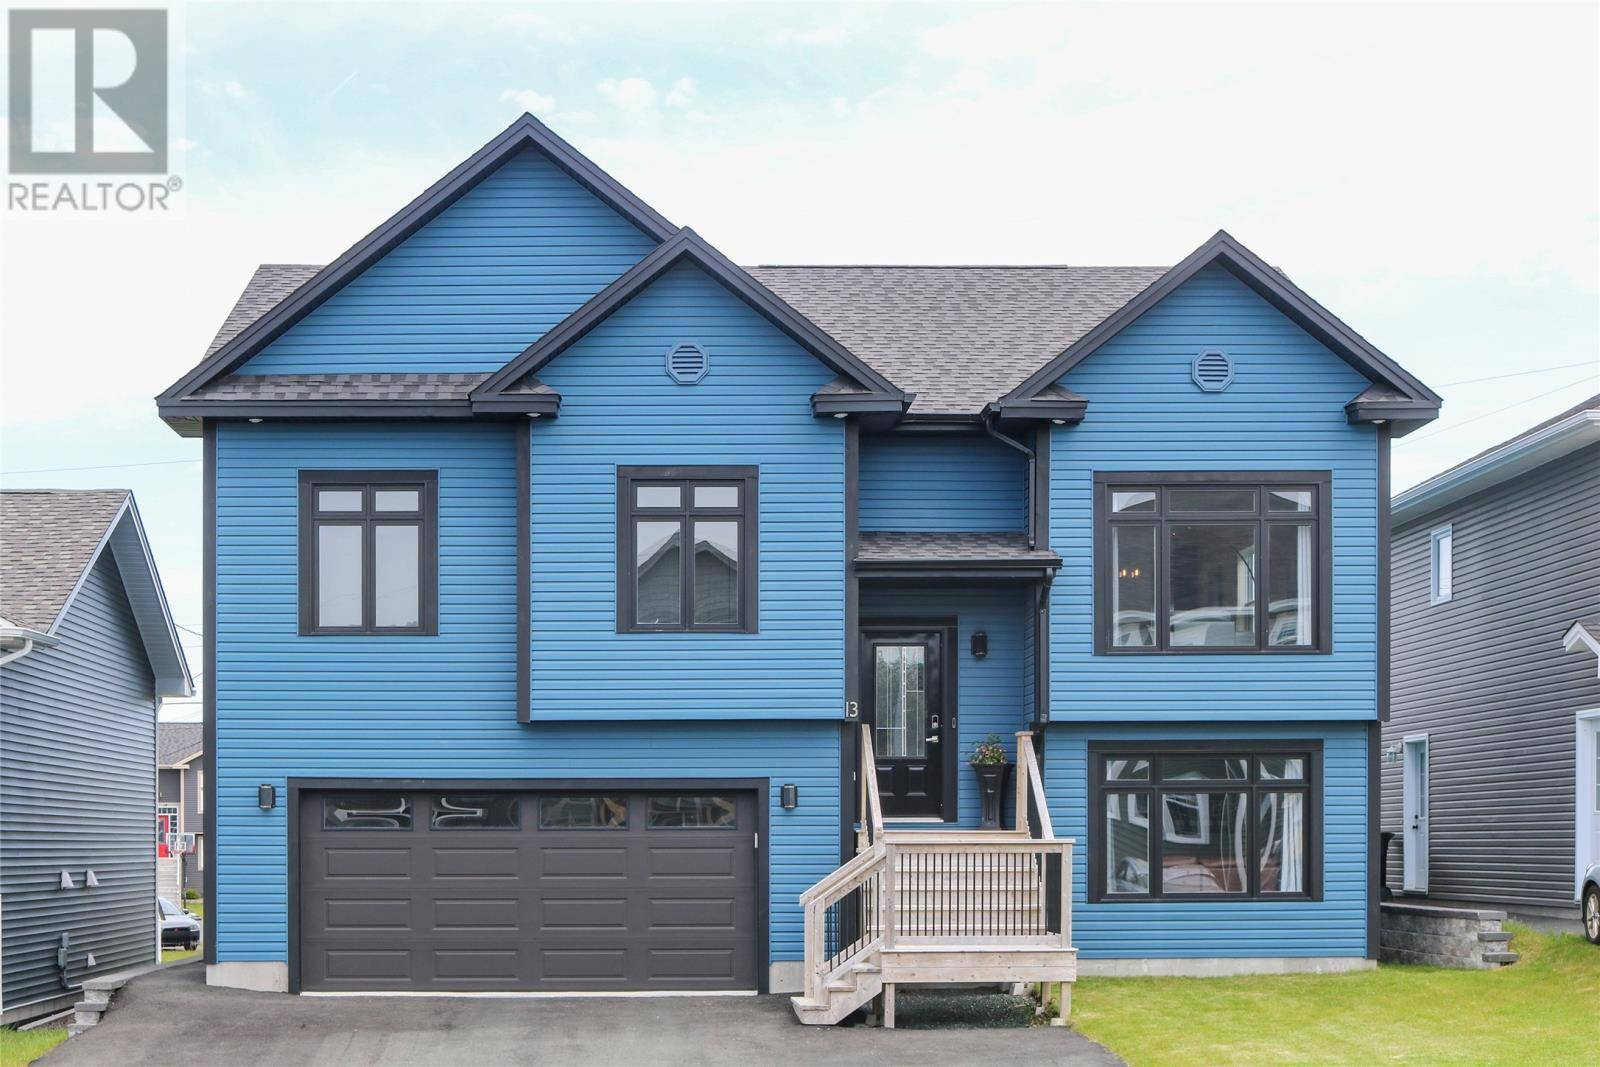 House for sale at 13 Caravelle Pl St. John's Newfoundland - MLS: 1206861